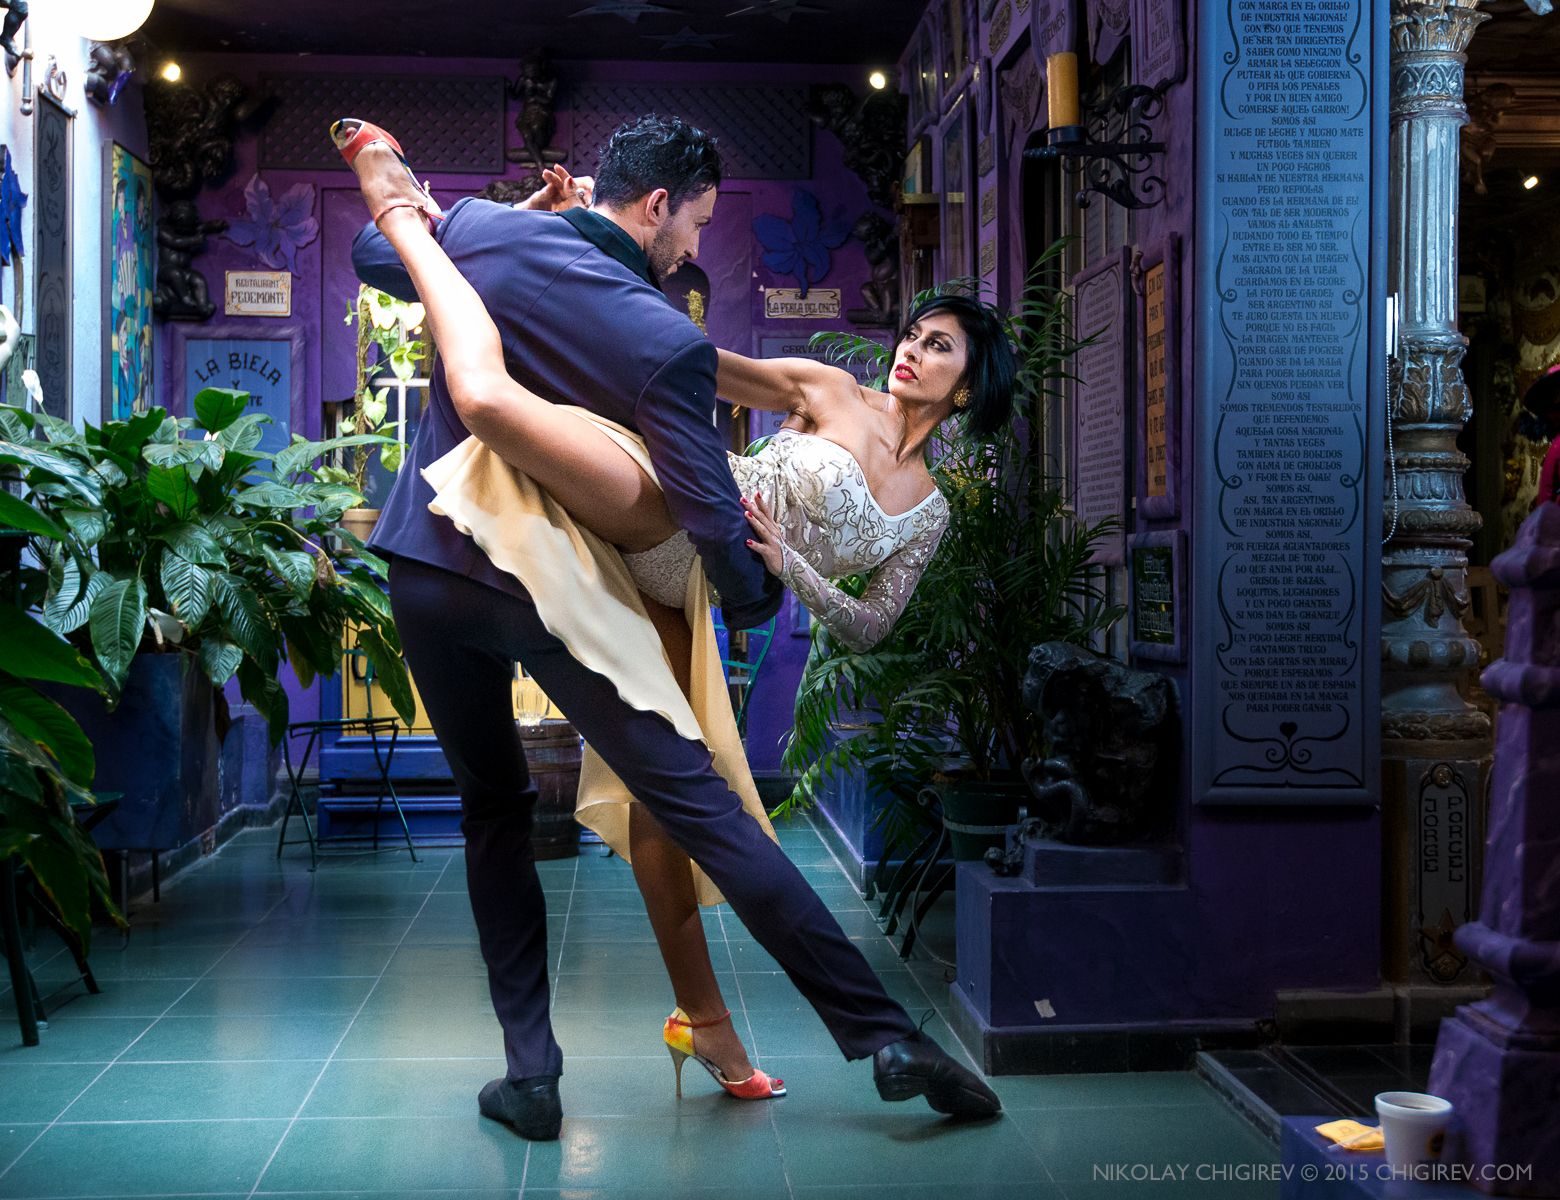 Chigirev Portrait Photography | Argentine Tango. Marcos Ayala and ...